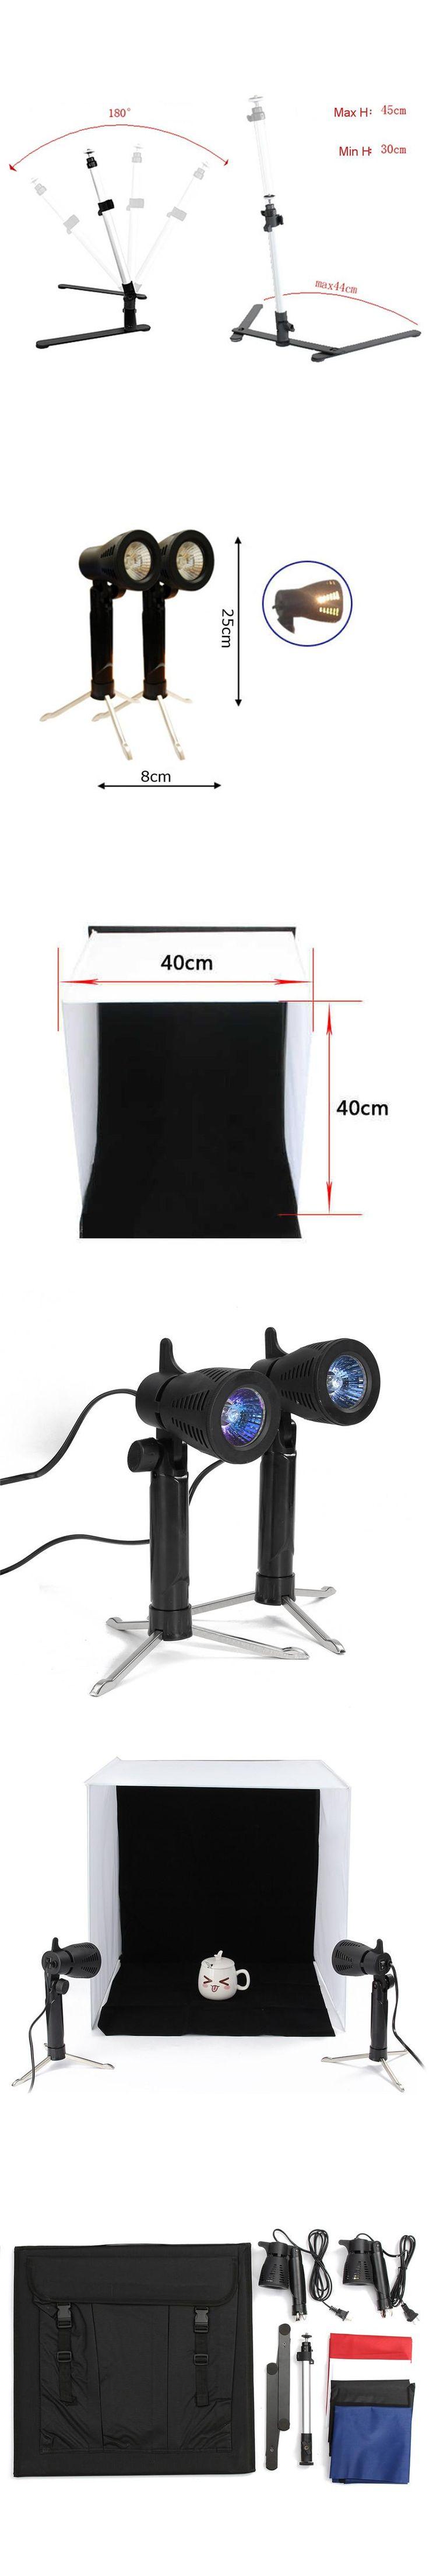 40x40CM Room Photo Studio Light Photography Lighting Tent Kit Backdrop Cube Box Photography Lighting Kit AC 110V-220V